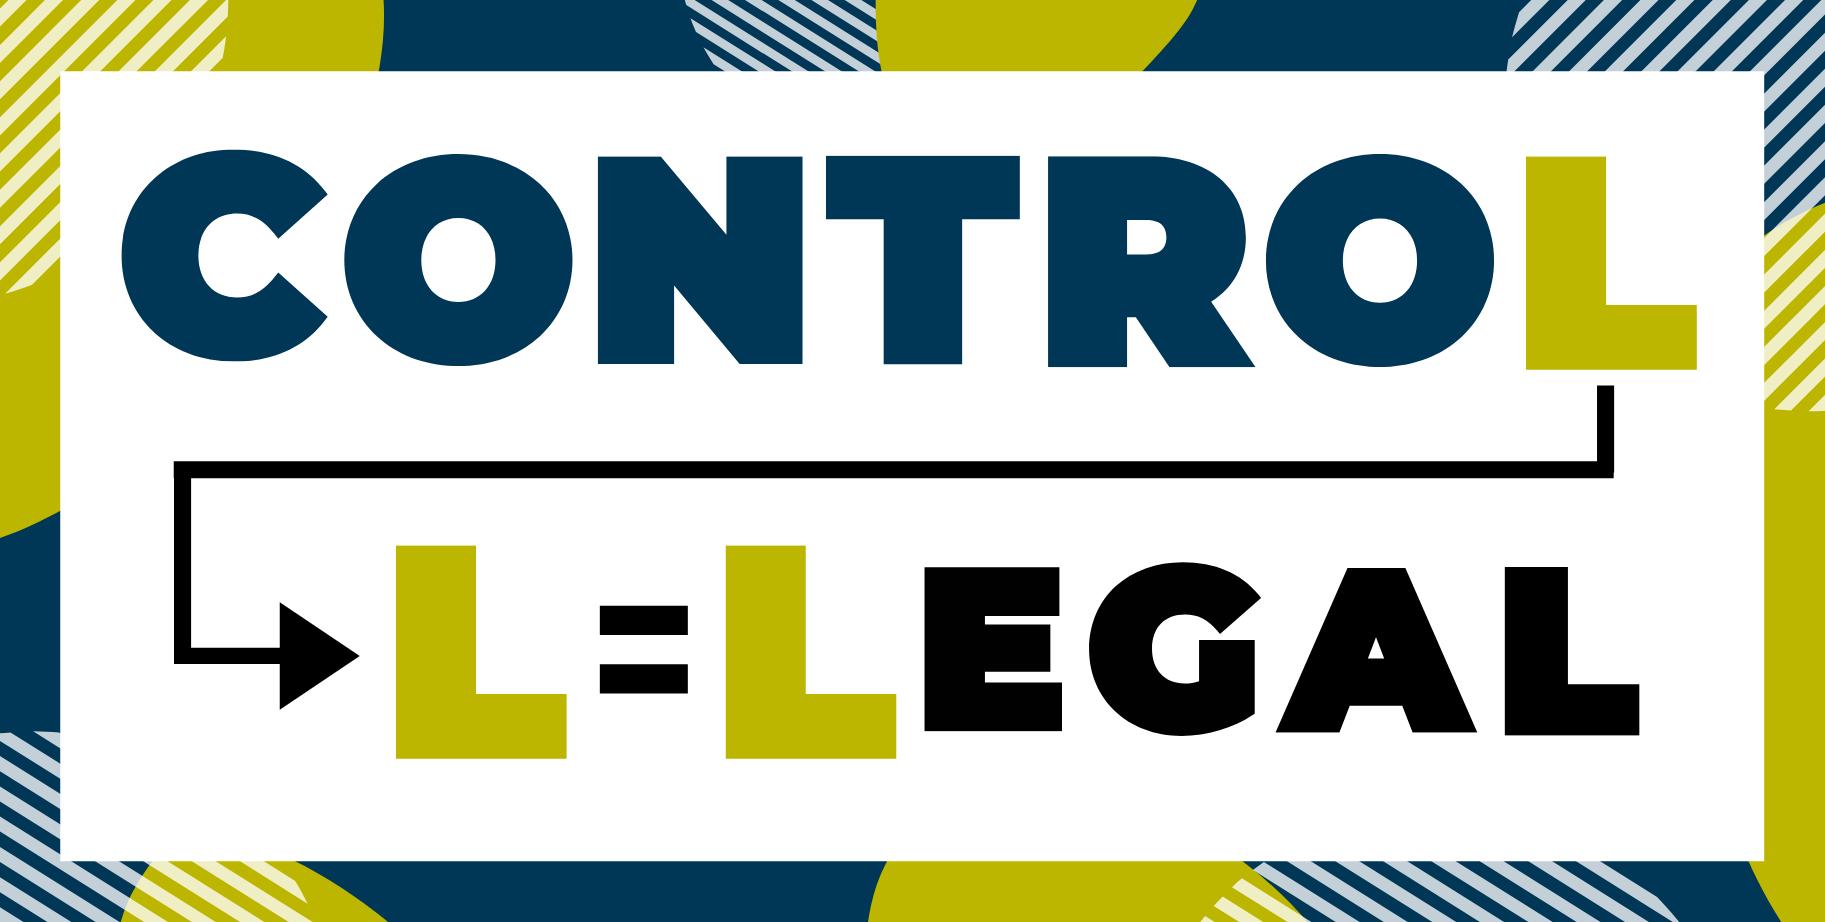 Letter l in control. L = Legal.